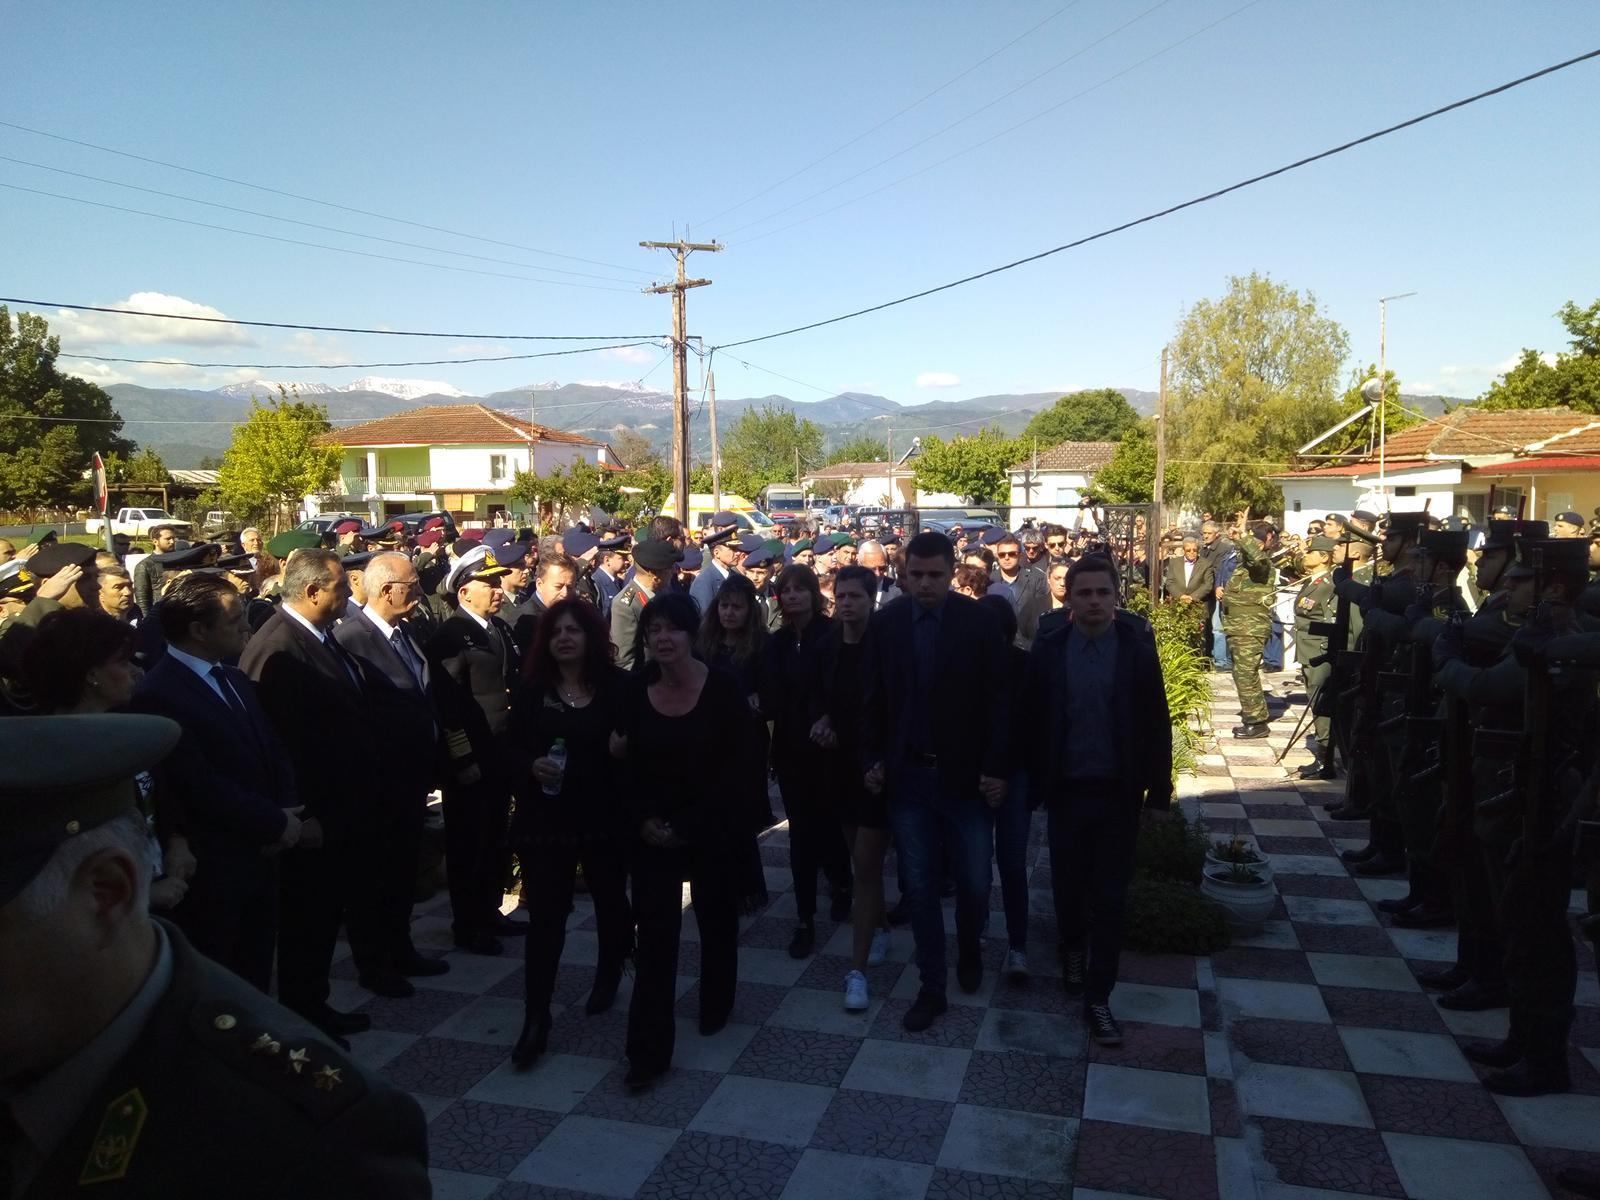 kidieia-paron-dyo Σπαραγμός στις κηδείες των στελεχών των Ενόπλων Δυνάμεων που σκοτώθηκαν με το μοιραίο Χιούι